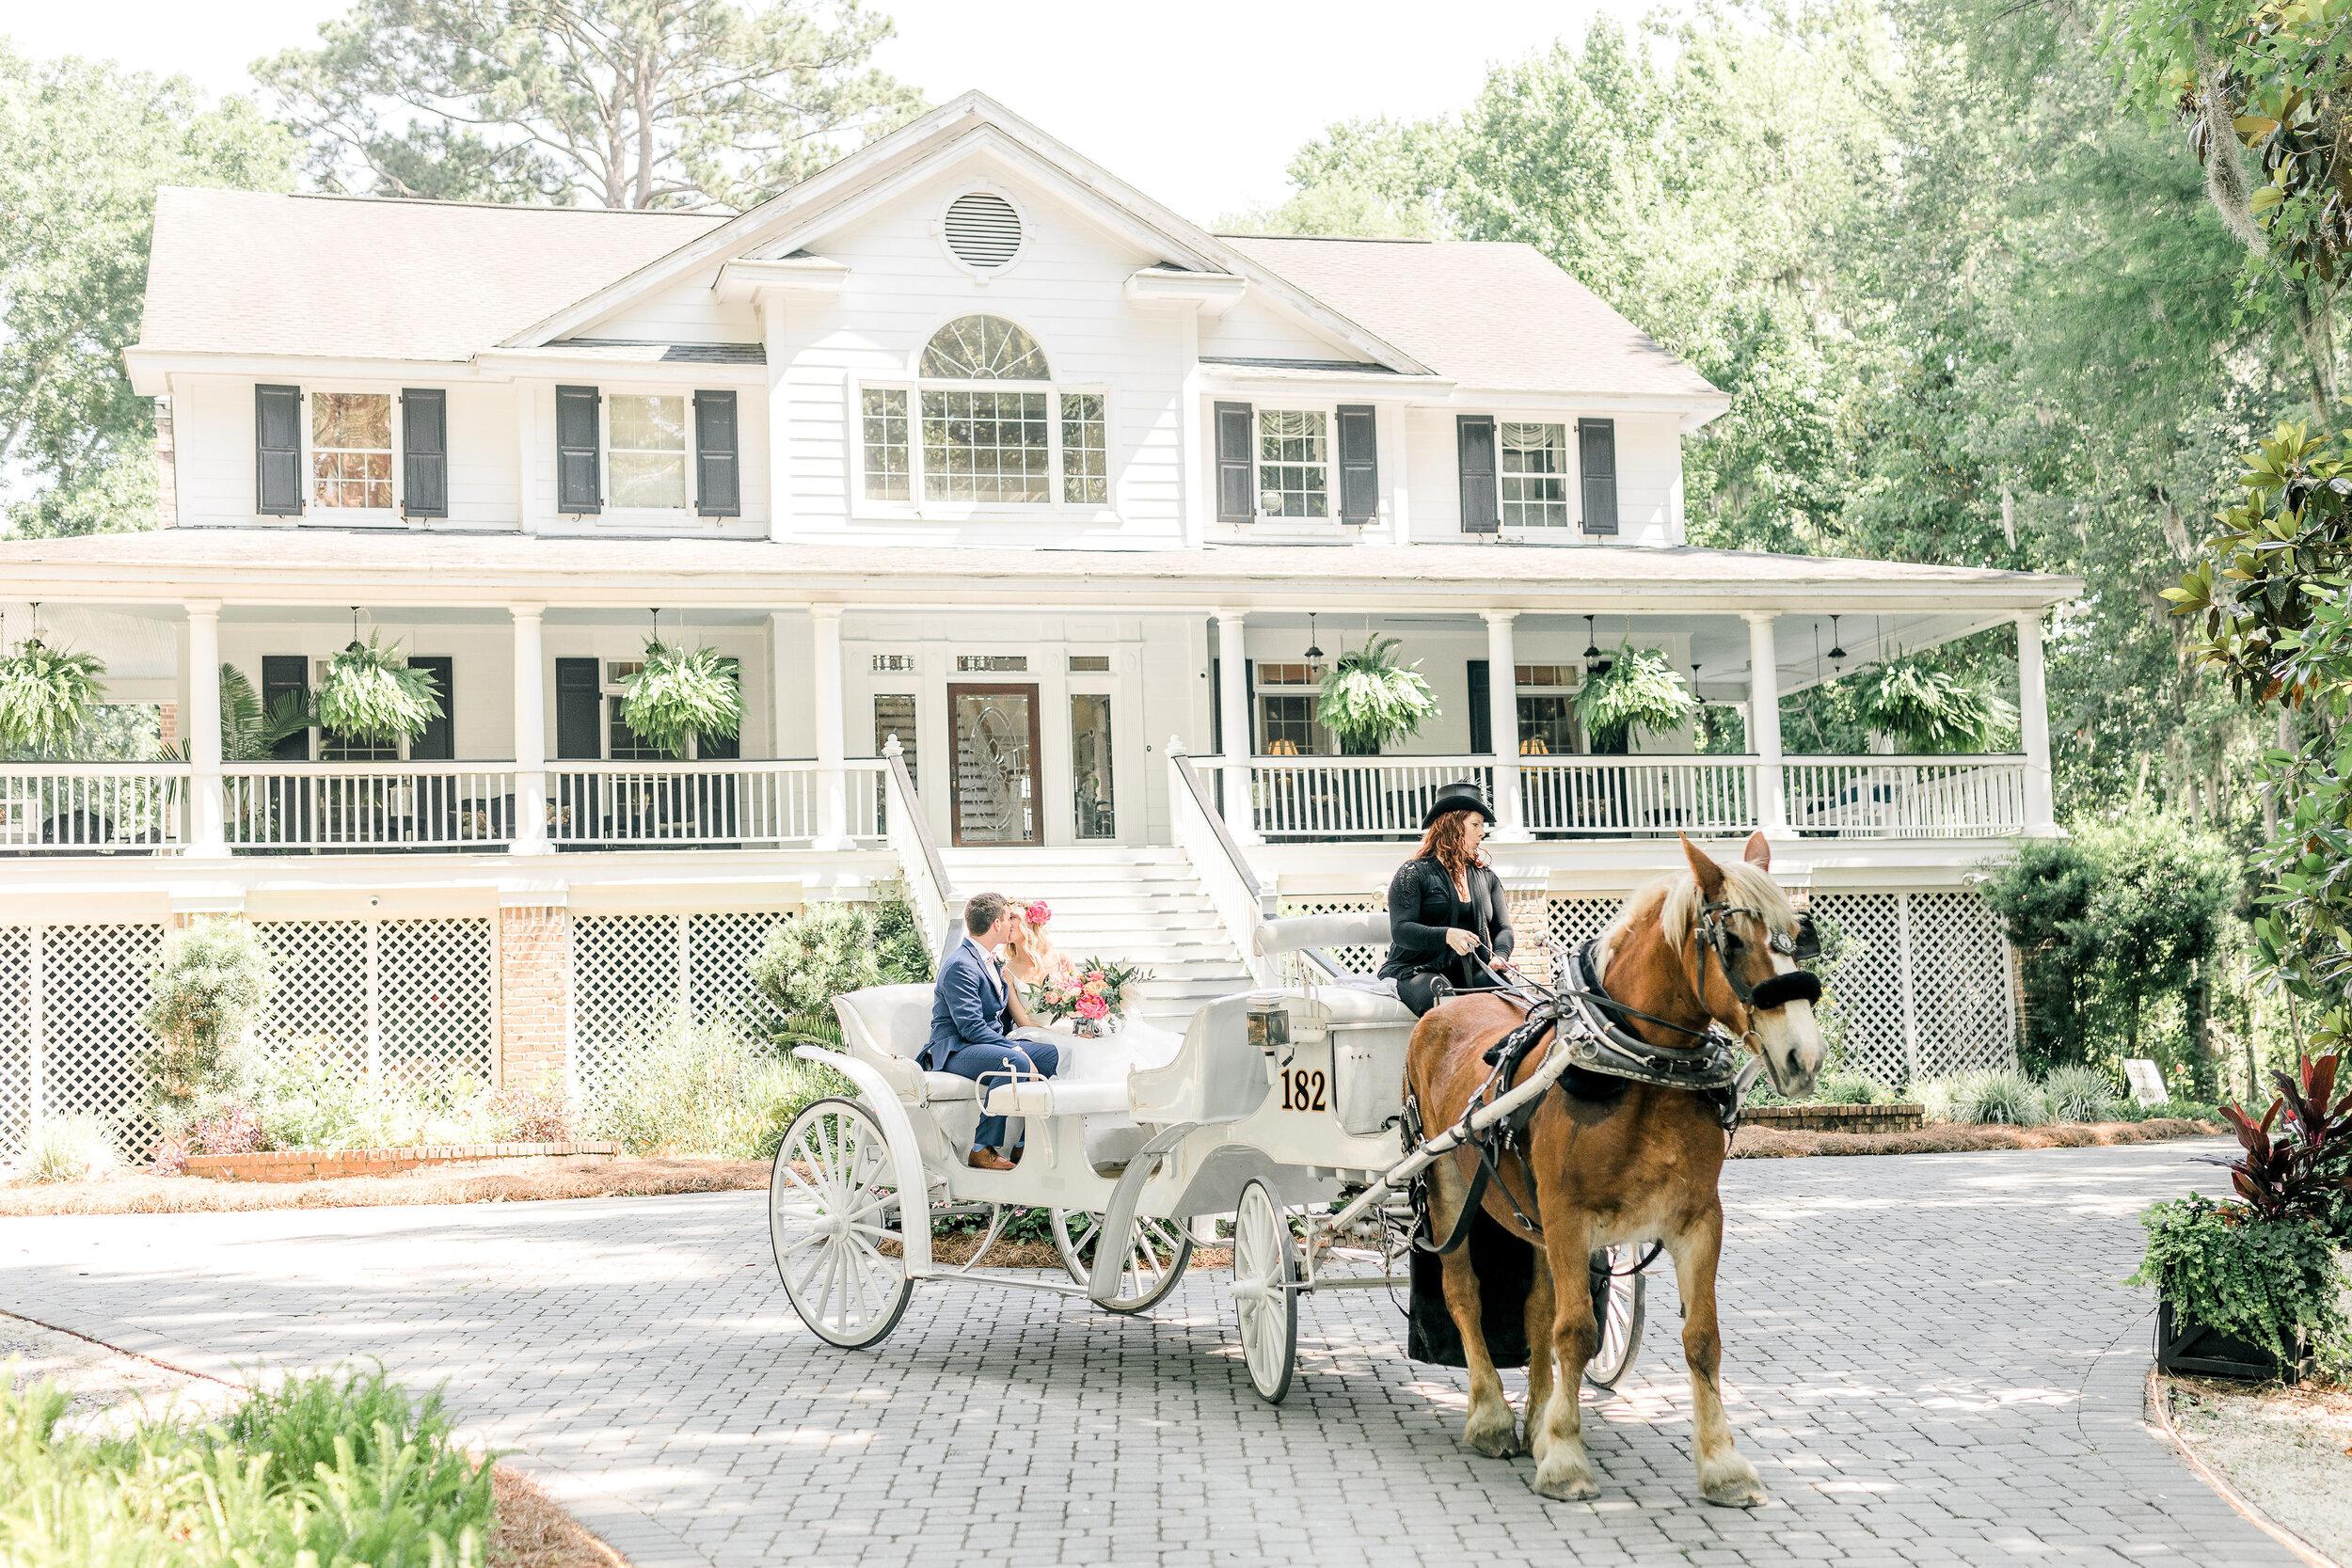 Mackey-house-wedding-savannah-wedding-horse-and-carriage-horse-drawn-carriage-bright-flowers-colorful-wedding-fairytale-wedding.jpg